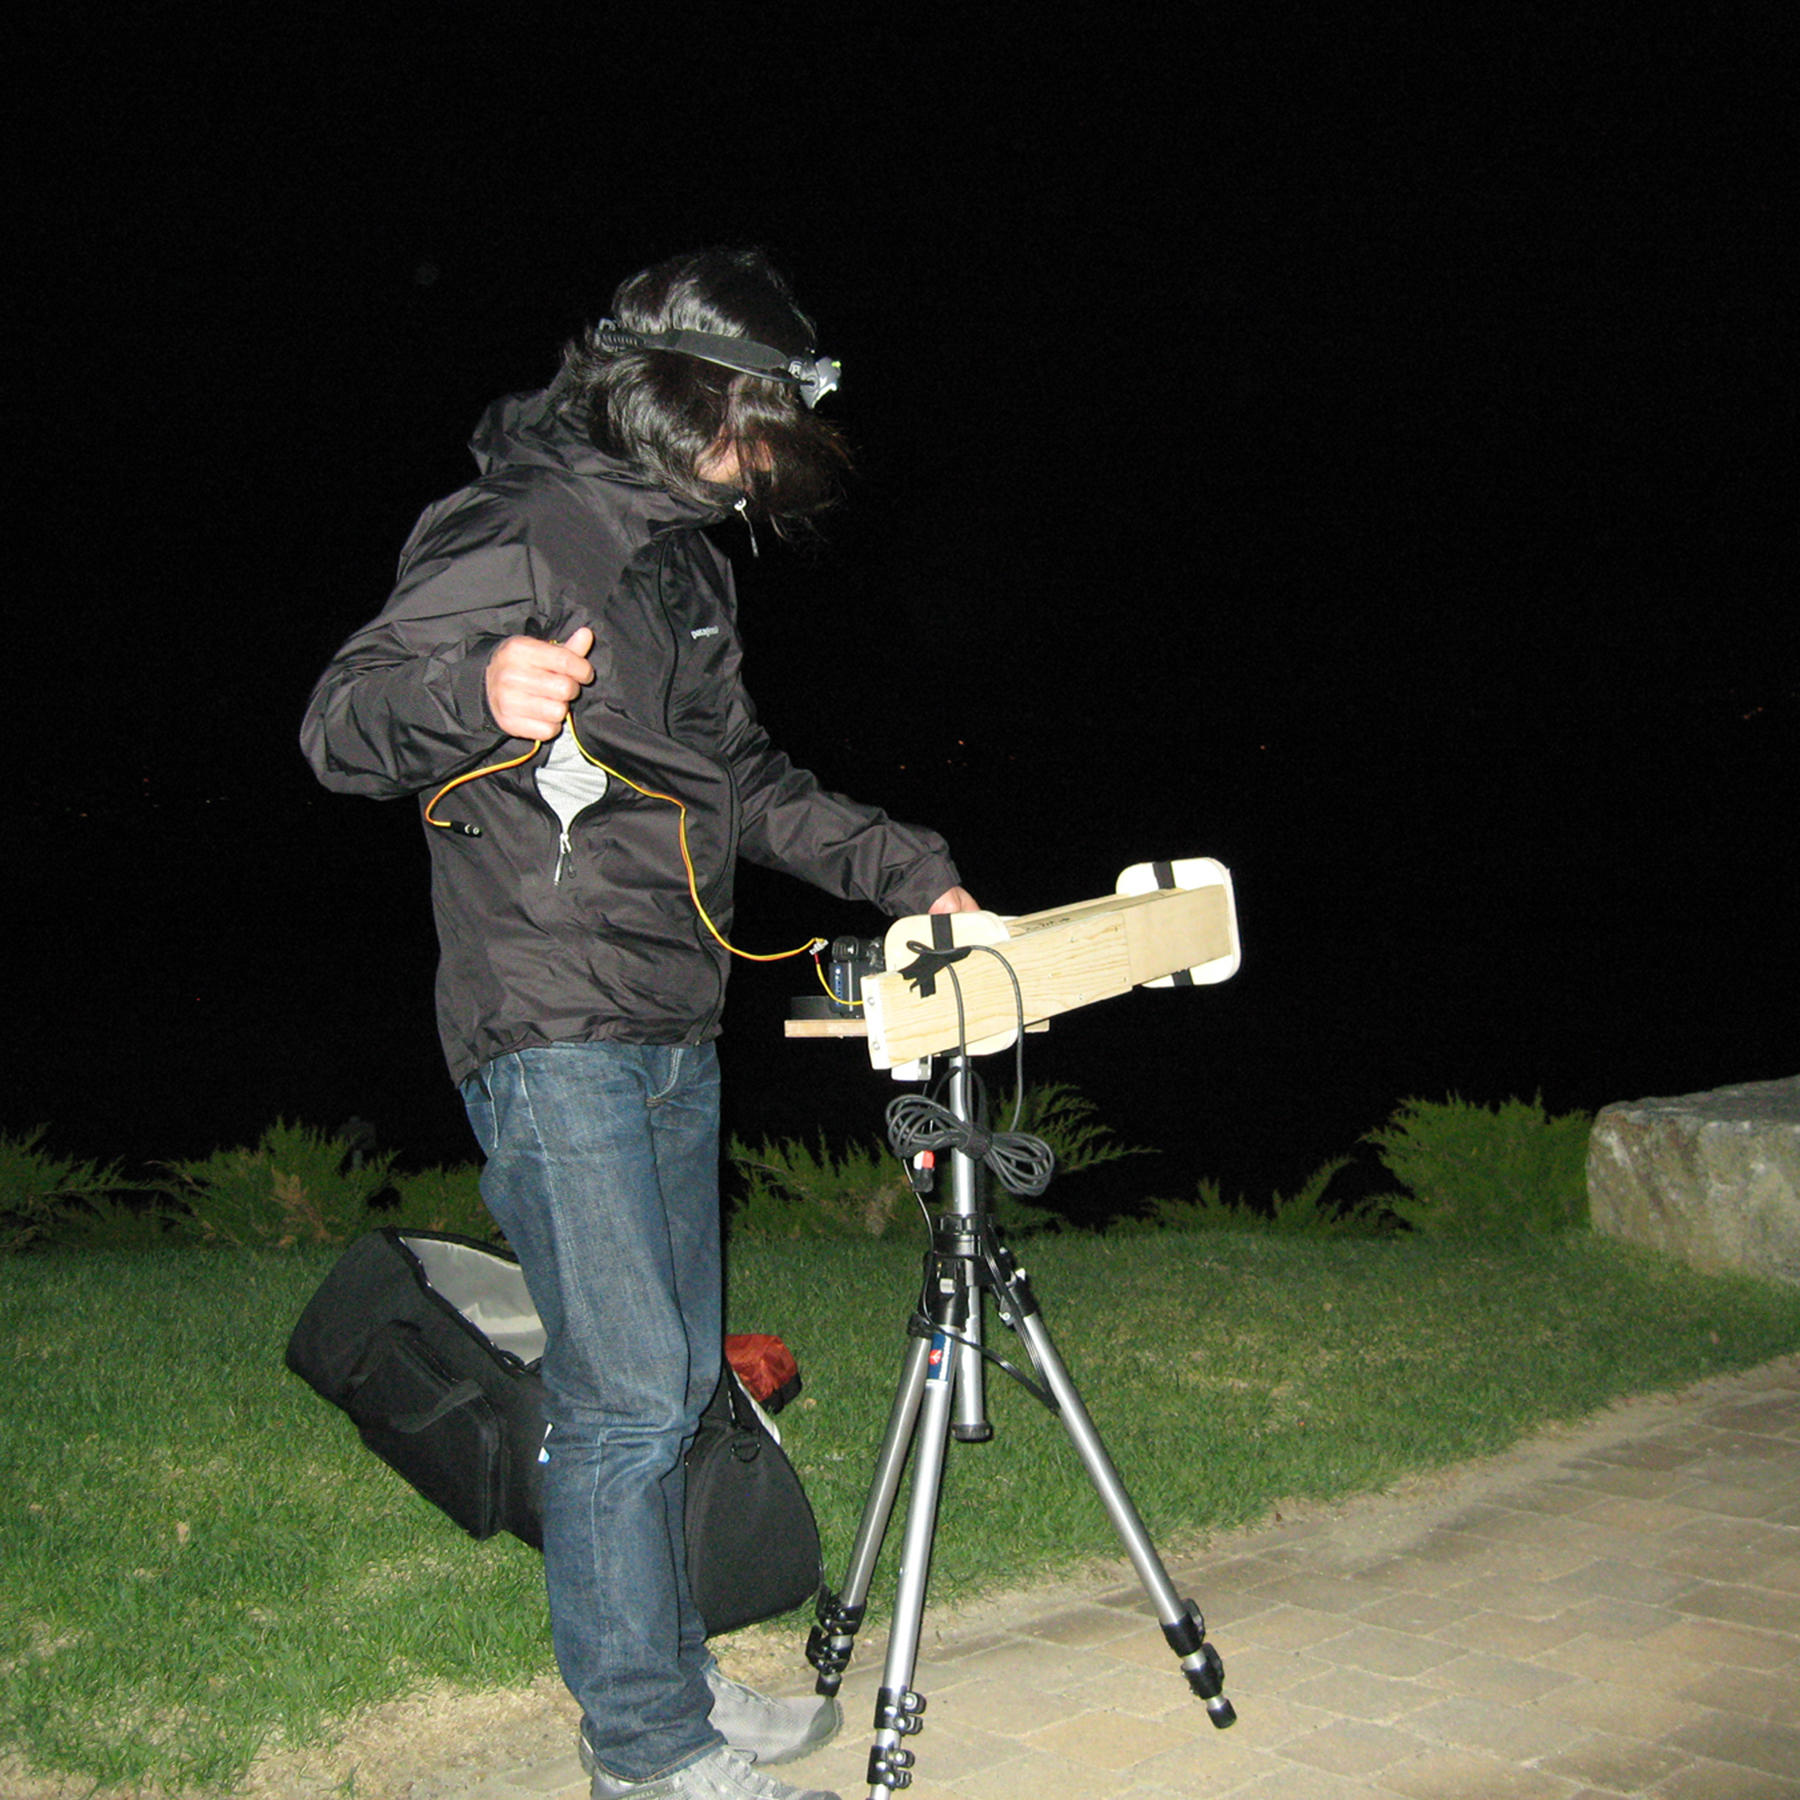 Taro Shinoda filming the moon and Boston with the telescope he built, 2007.